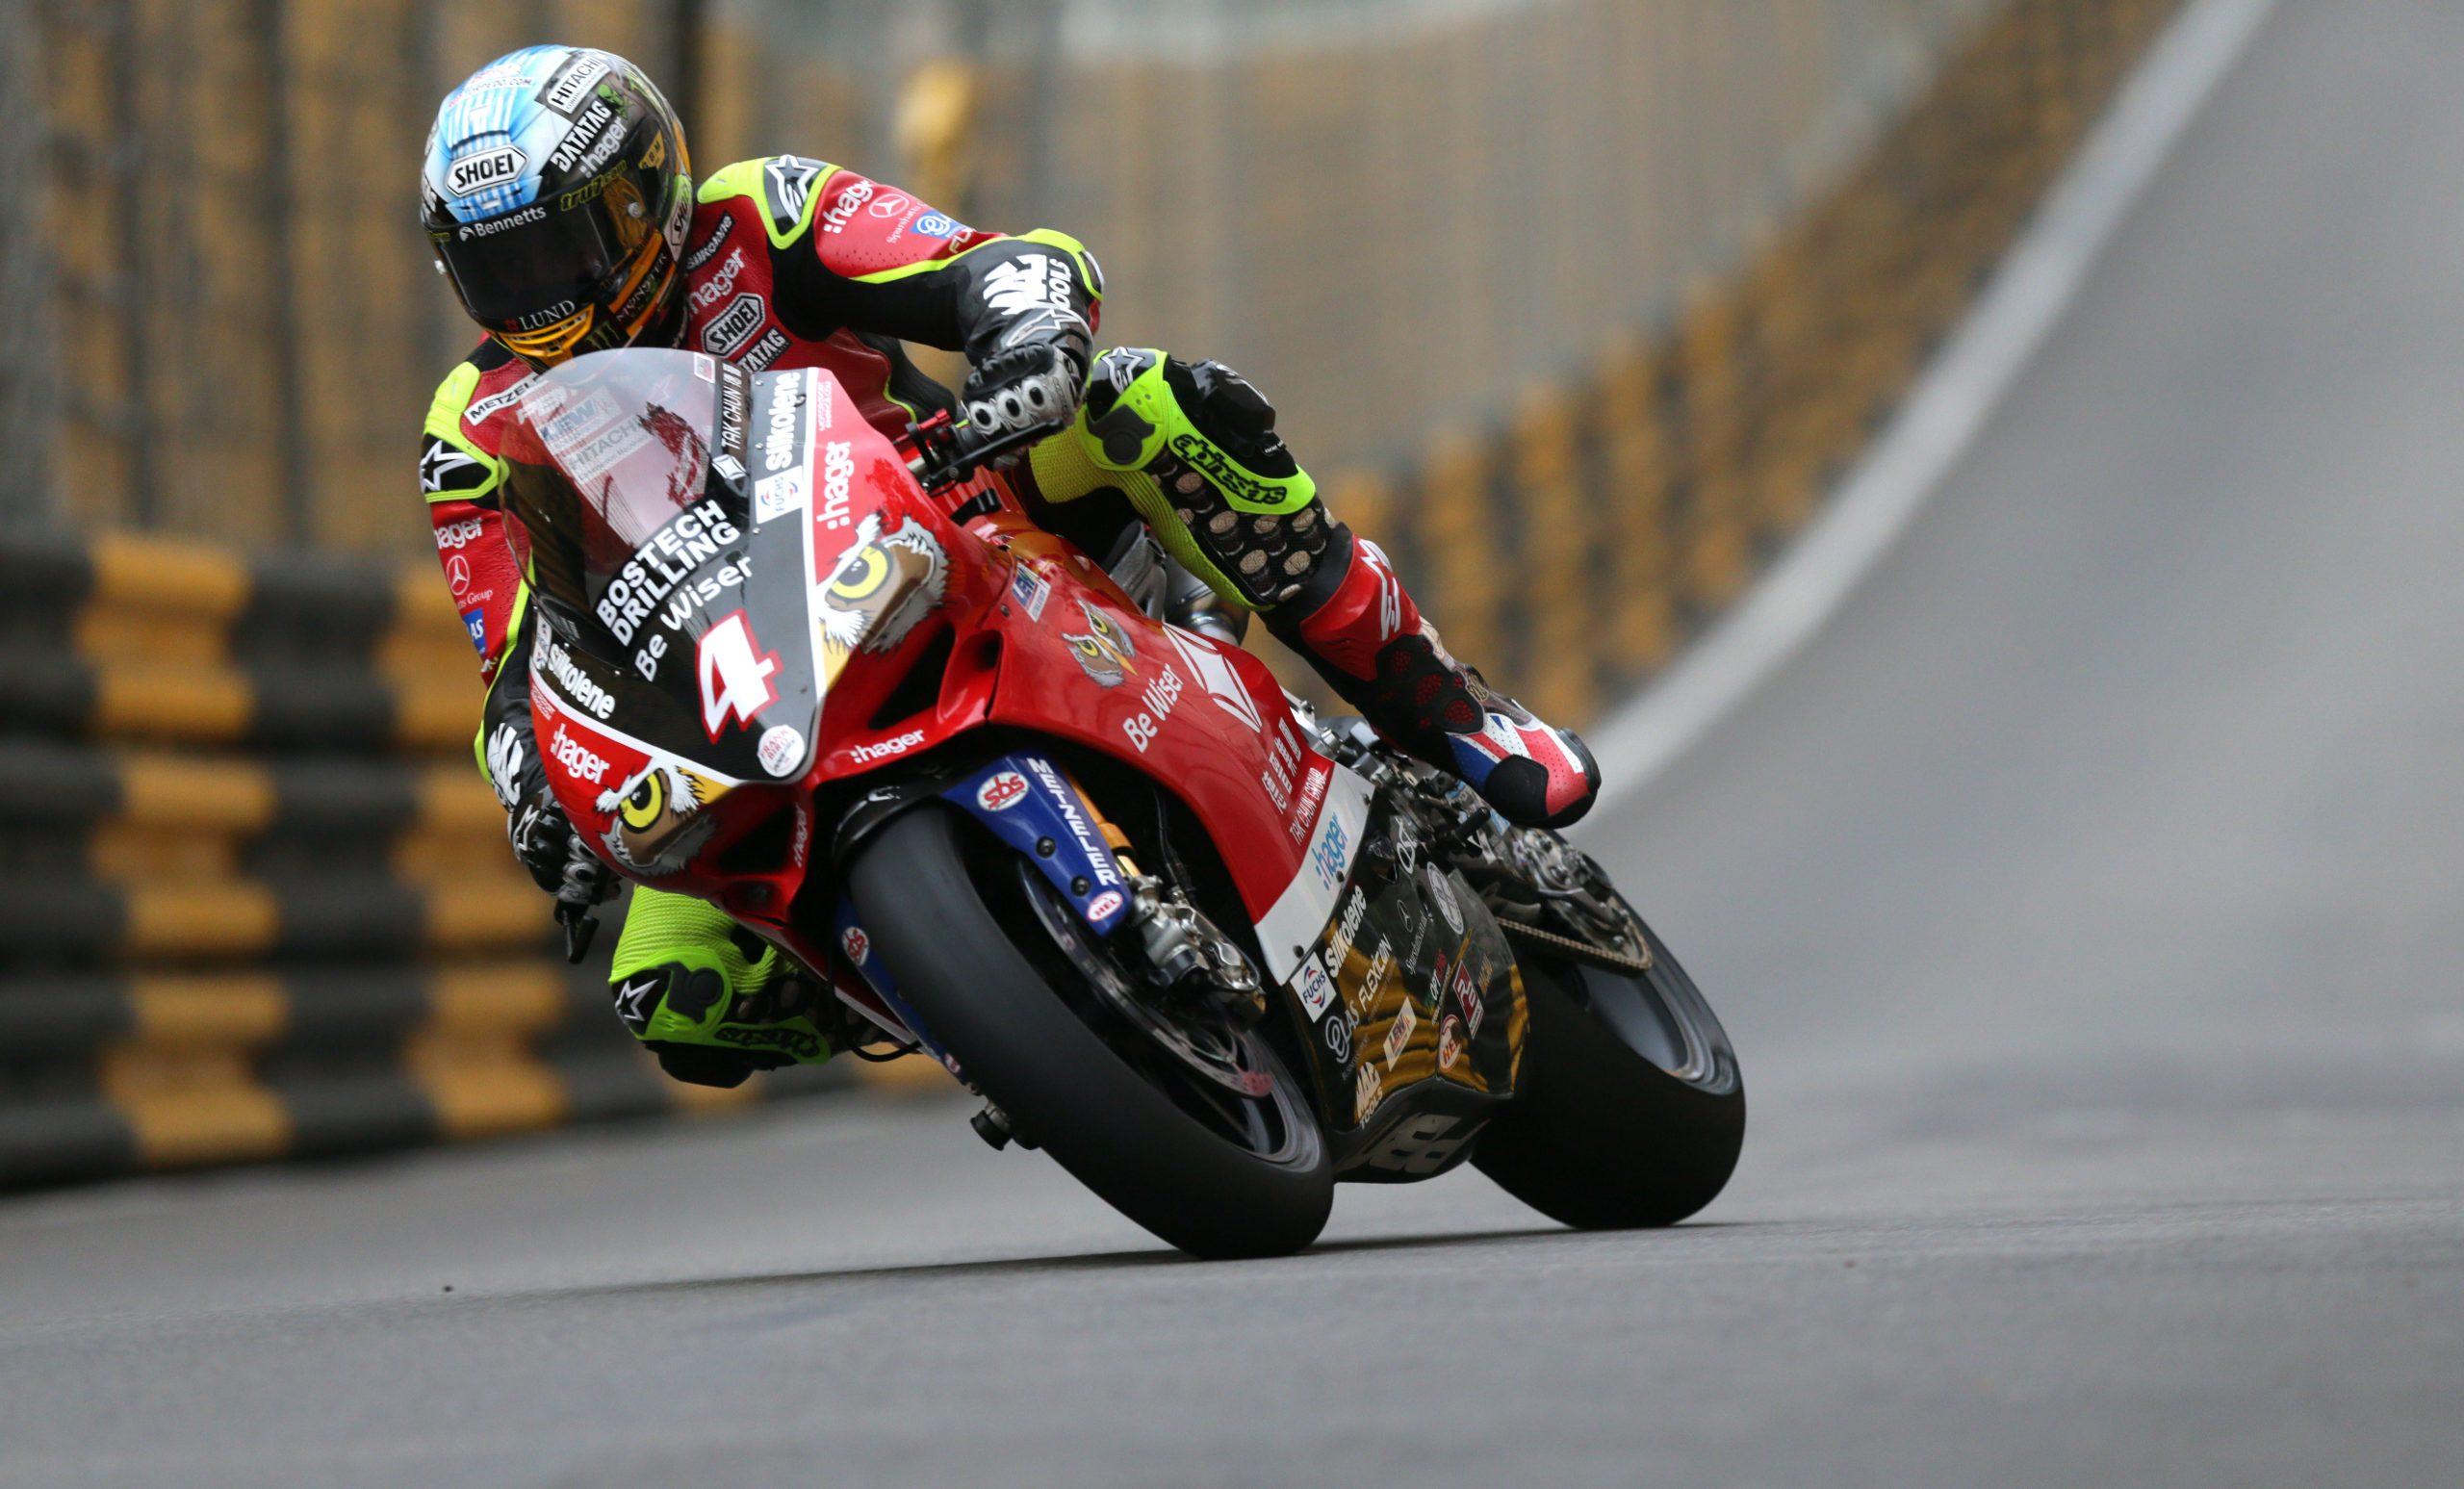 John McGuinness racing at 2018 Macau GP